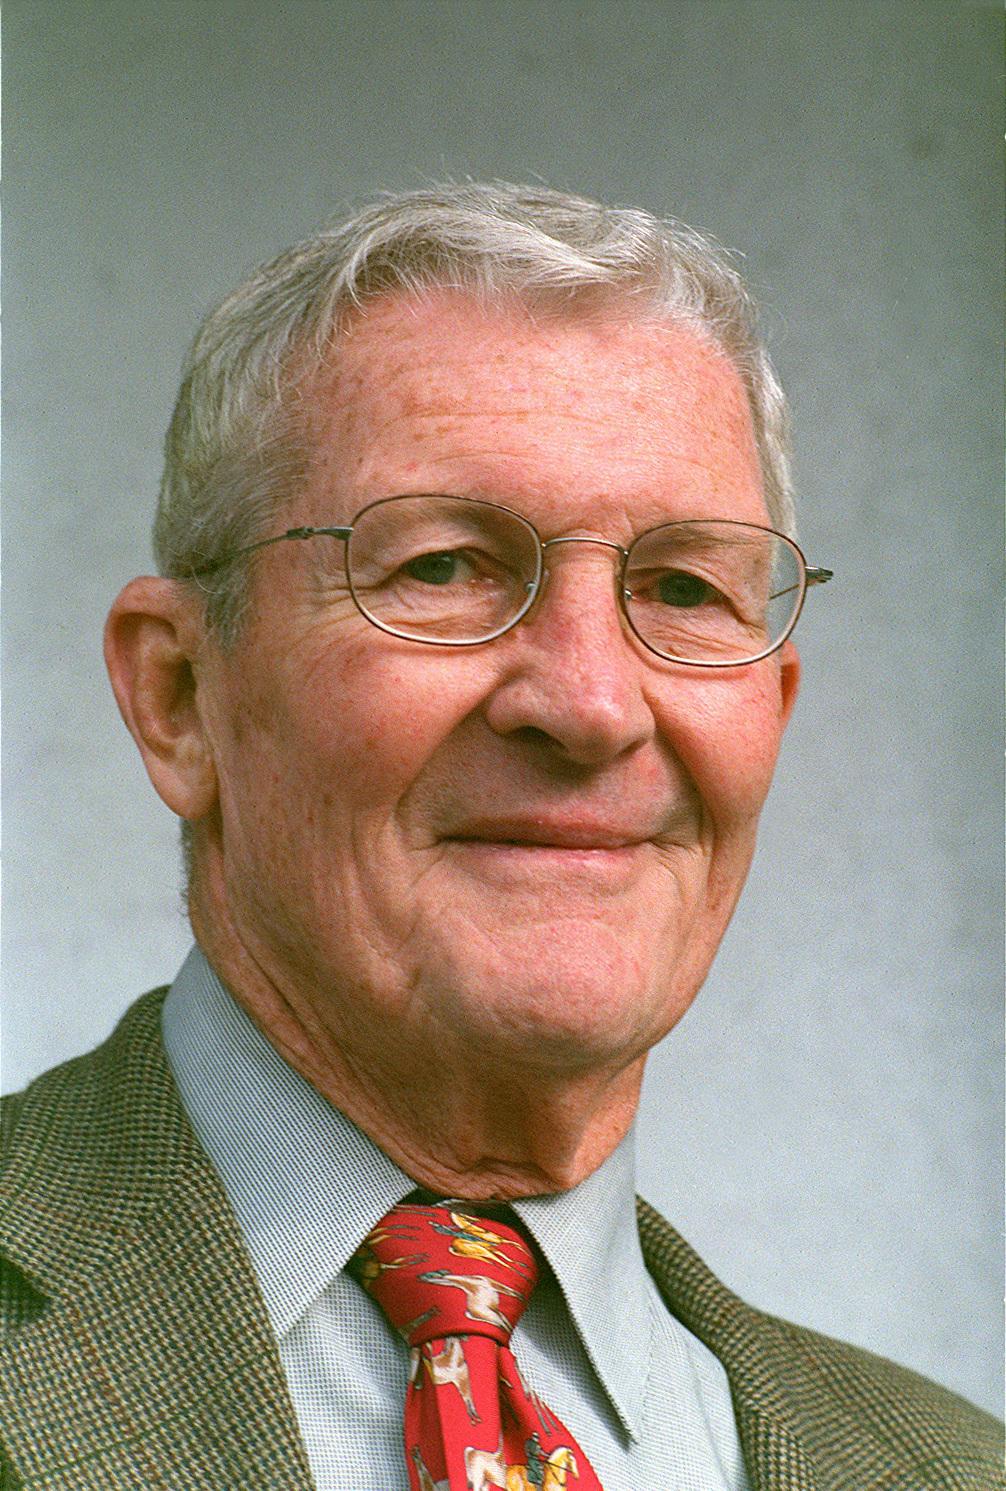 San Francisco Law School >> Terence Hallinan - Wikipedia